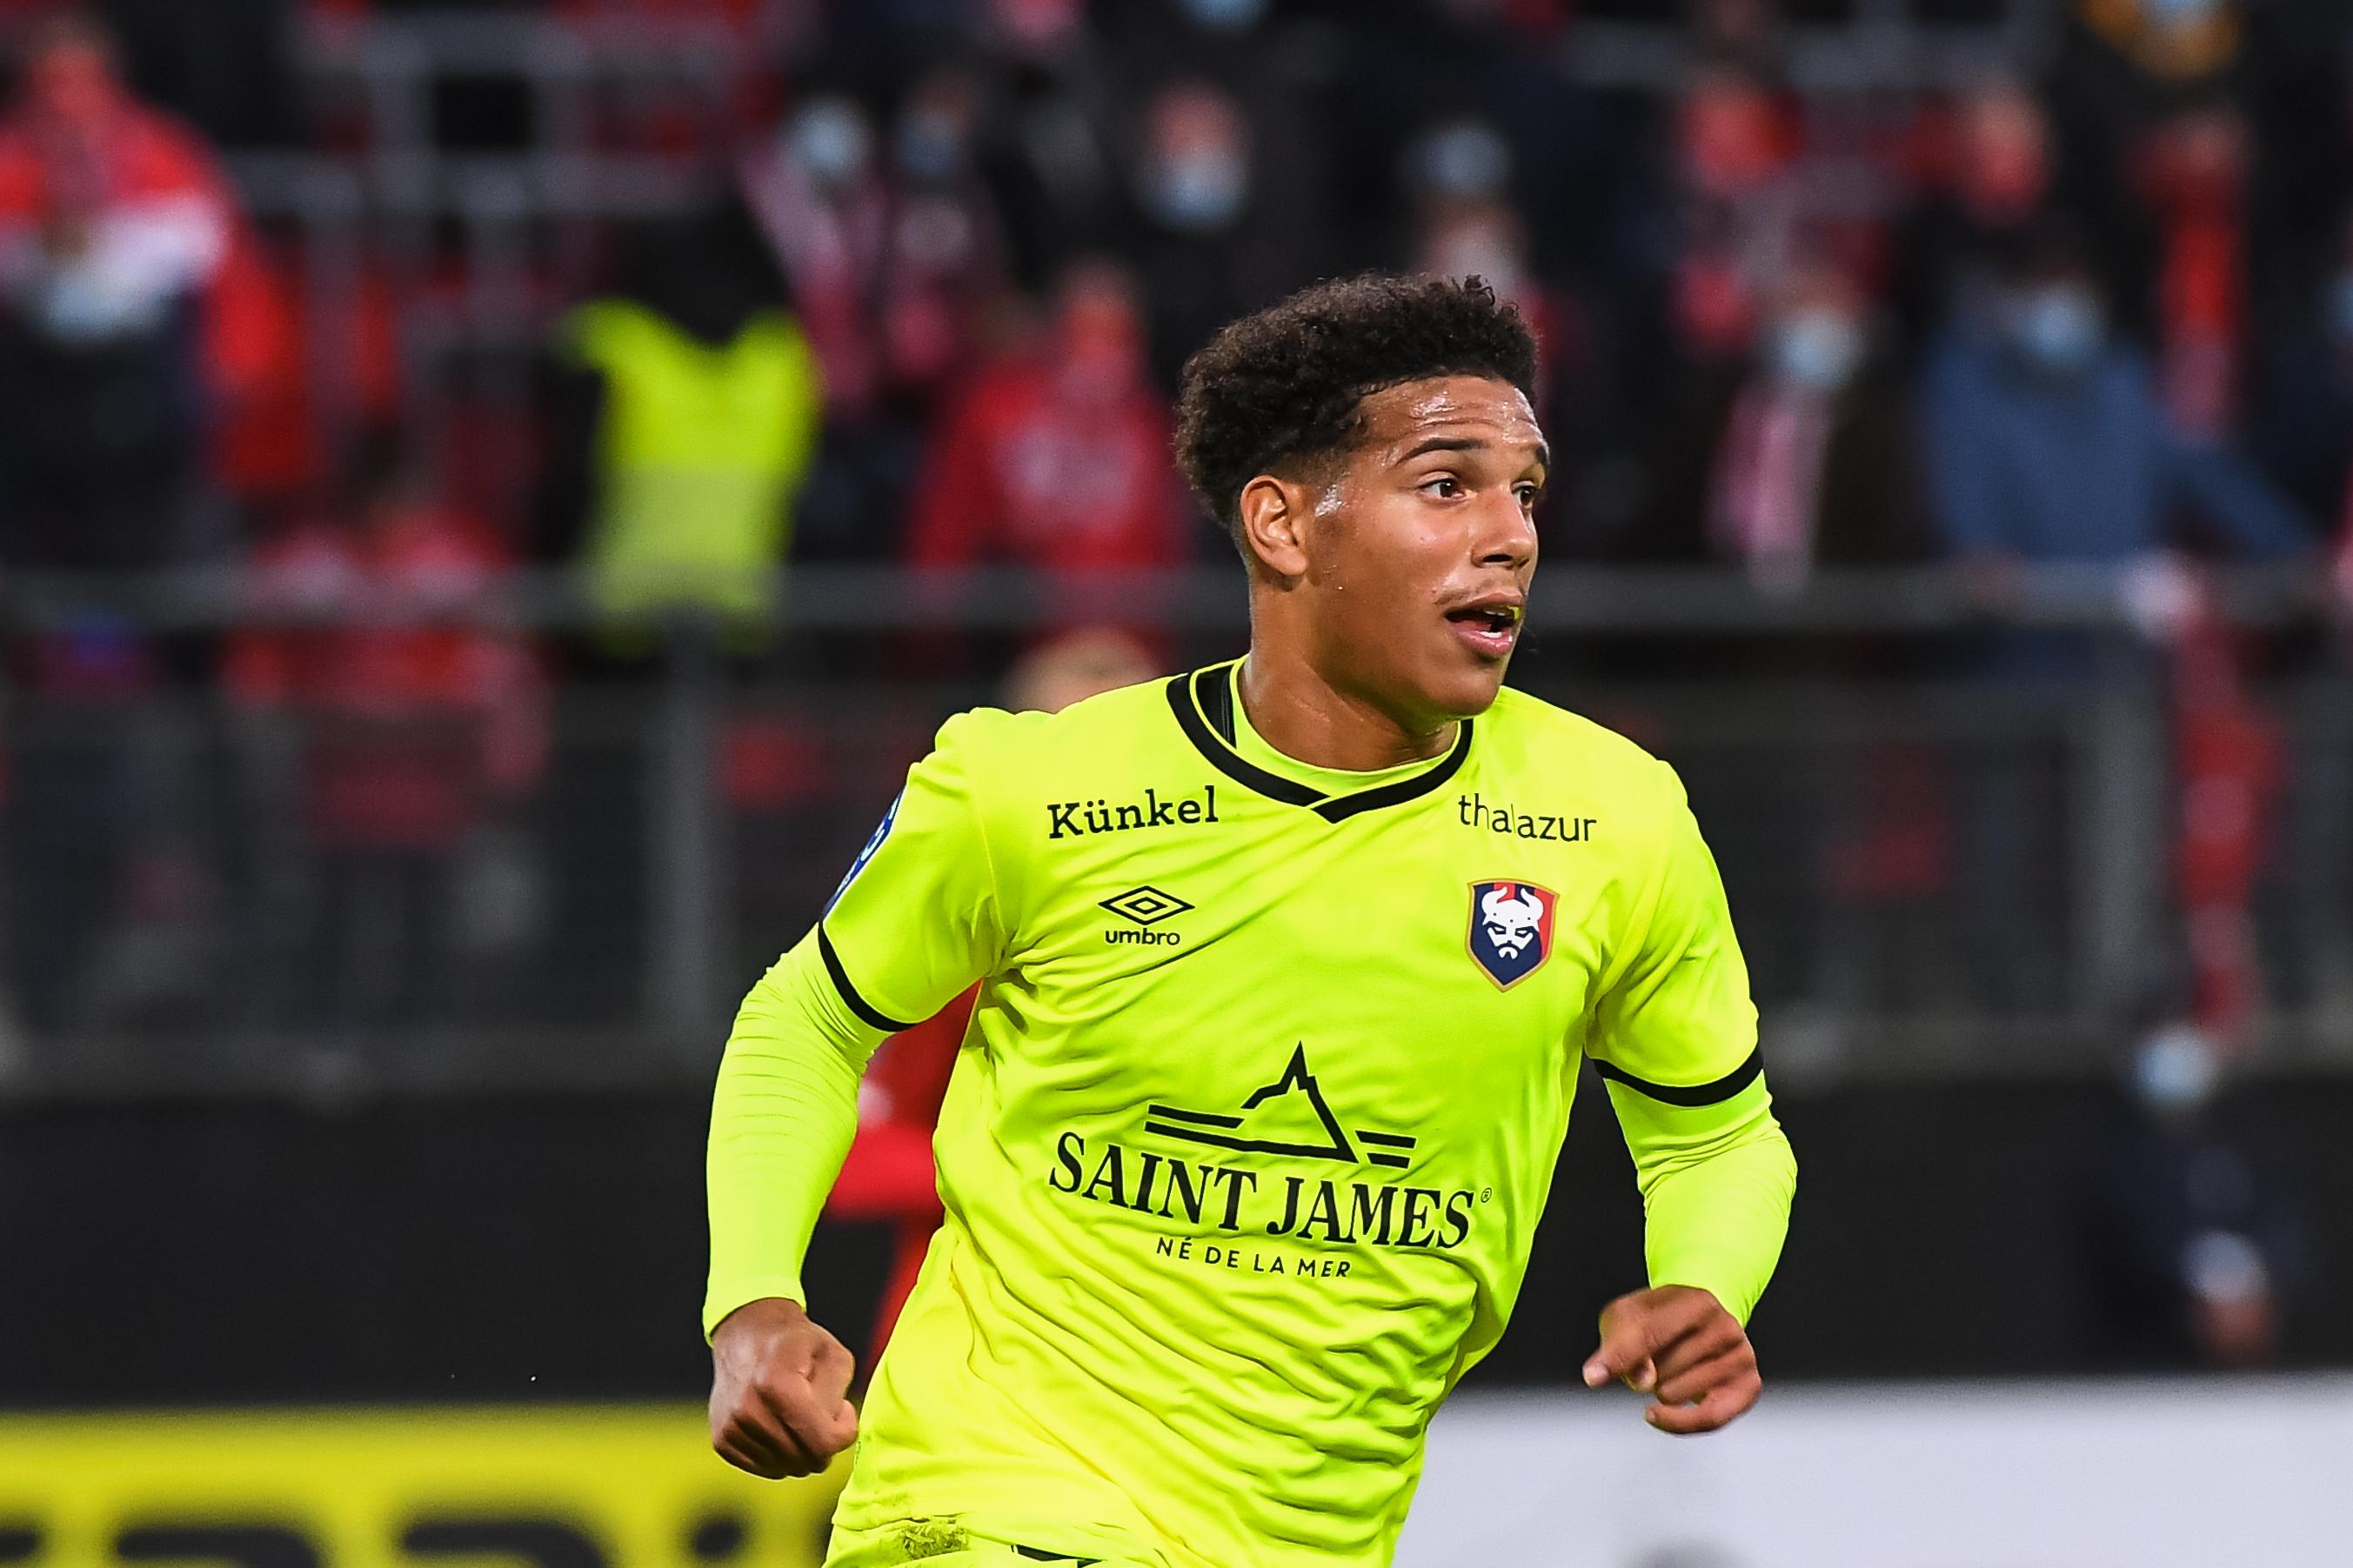 Valenciennes FC v Stade Malherbe Caen Calvados Basse-Normandie - Ligue 2 BKT